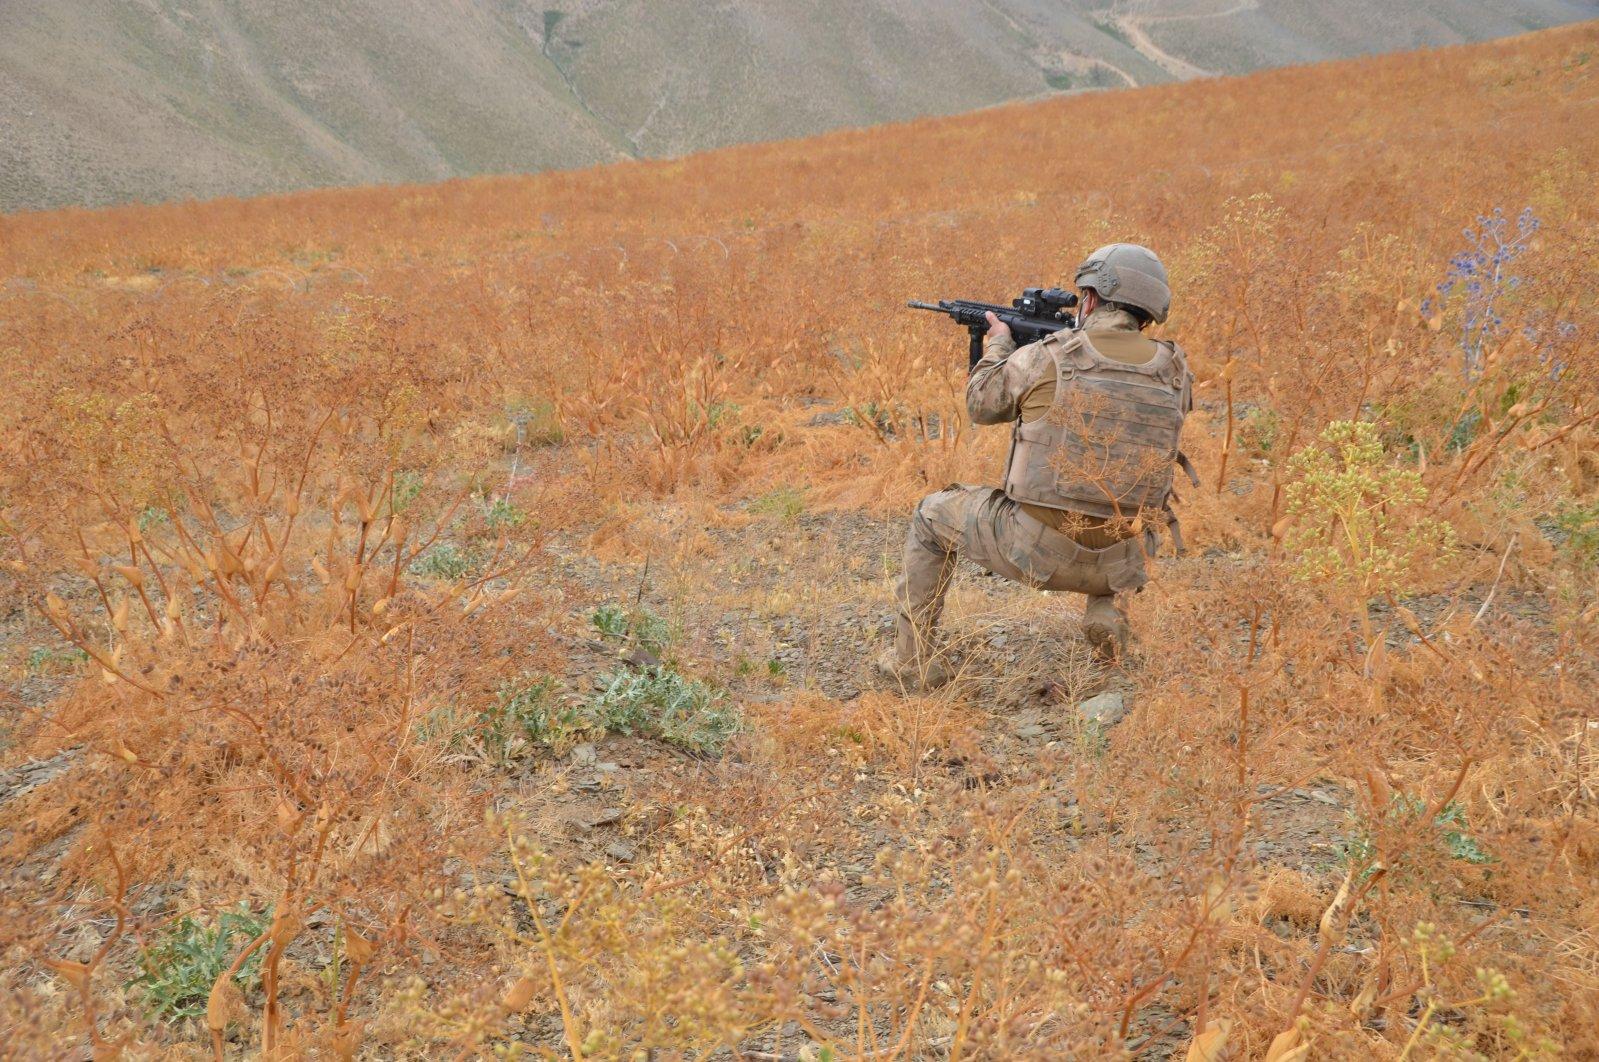 Security forces are seen on duty in Hakkari province's Yüksekova district, Turkey, July 30, 2021. (AA Photo)